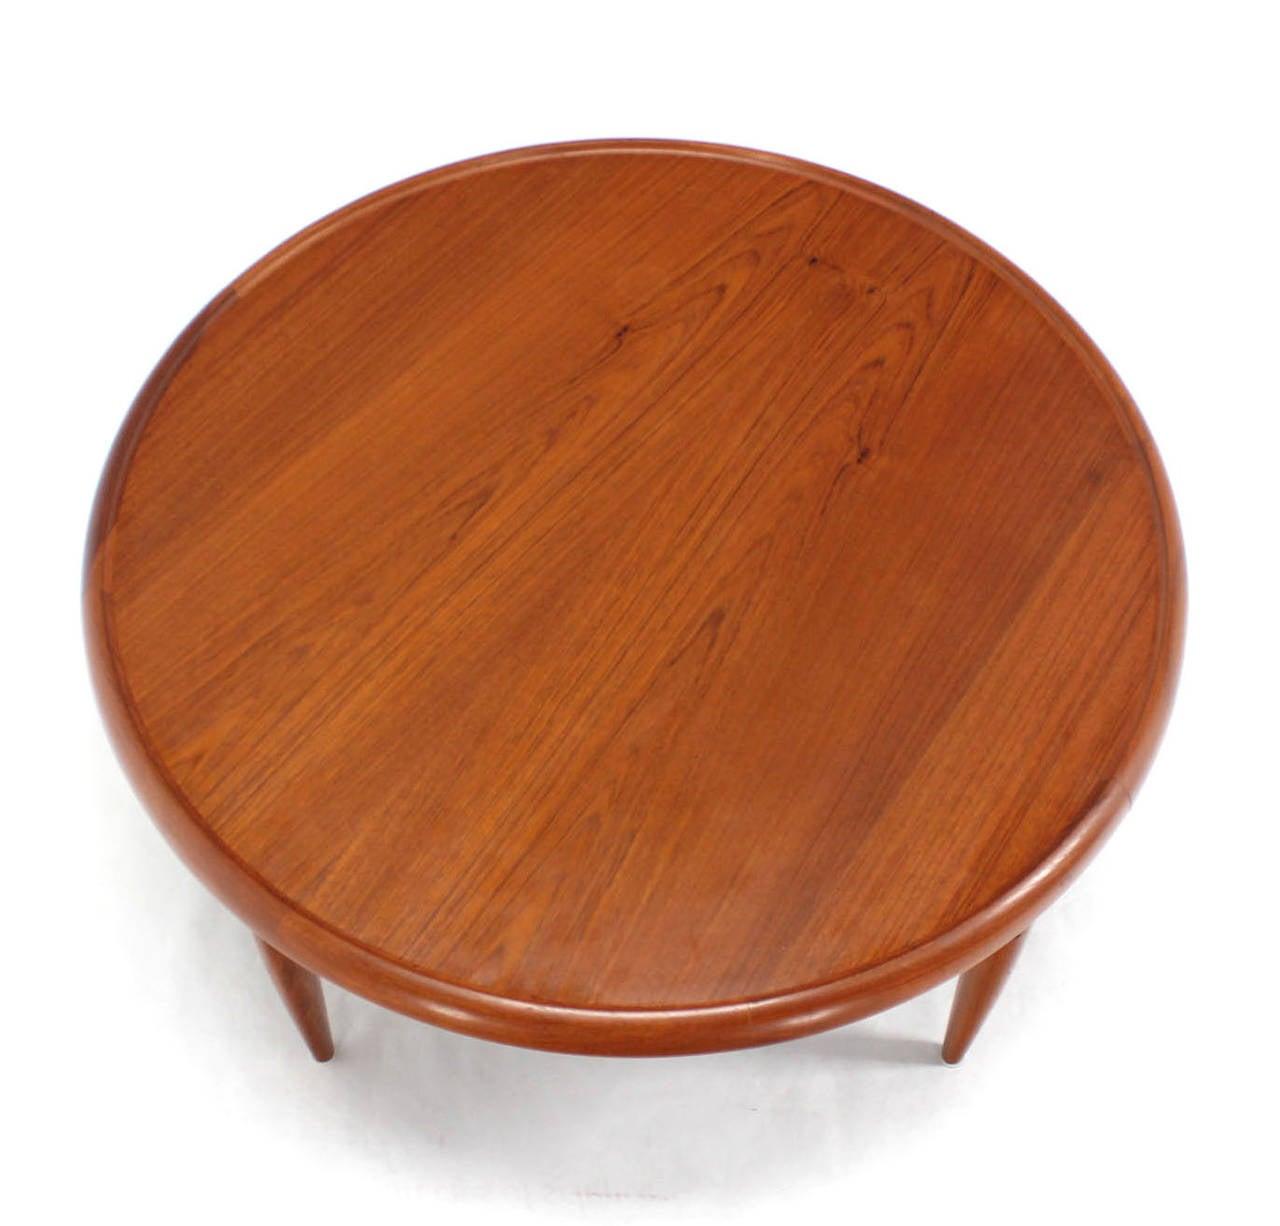 Lane Switchblade Coffee Table: Reversible Flip-Top Danish Modern Round Teak Coffee Table